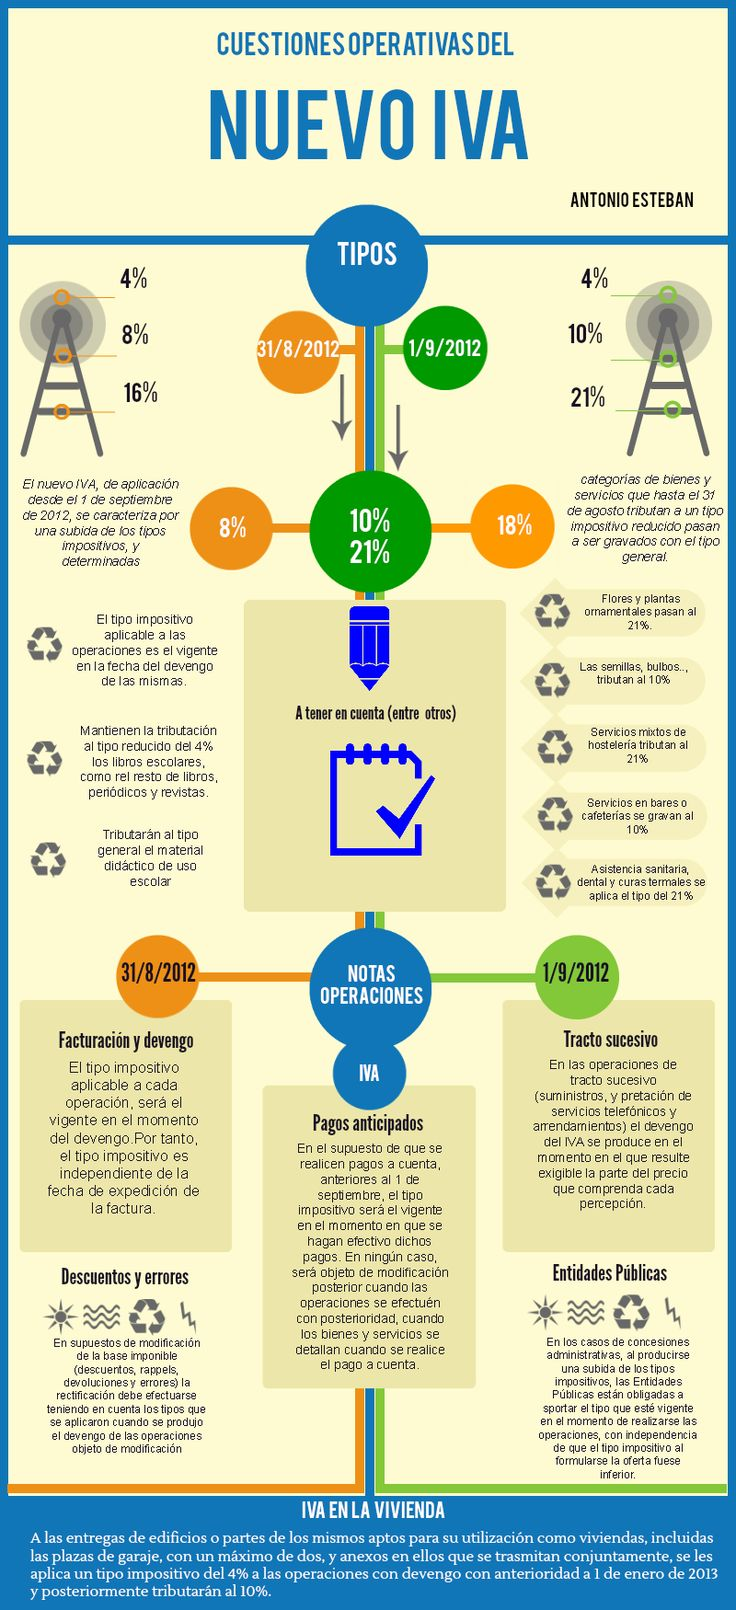 Buena Infografía Aclaracion Subida IVA